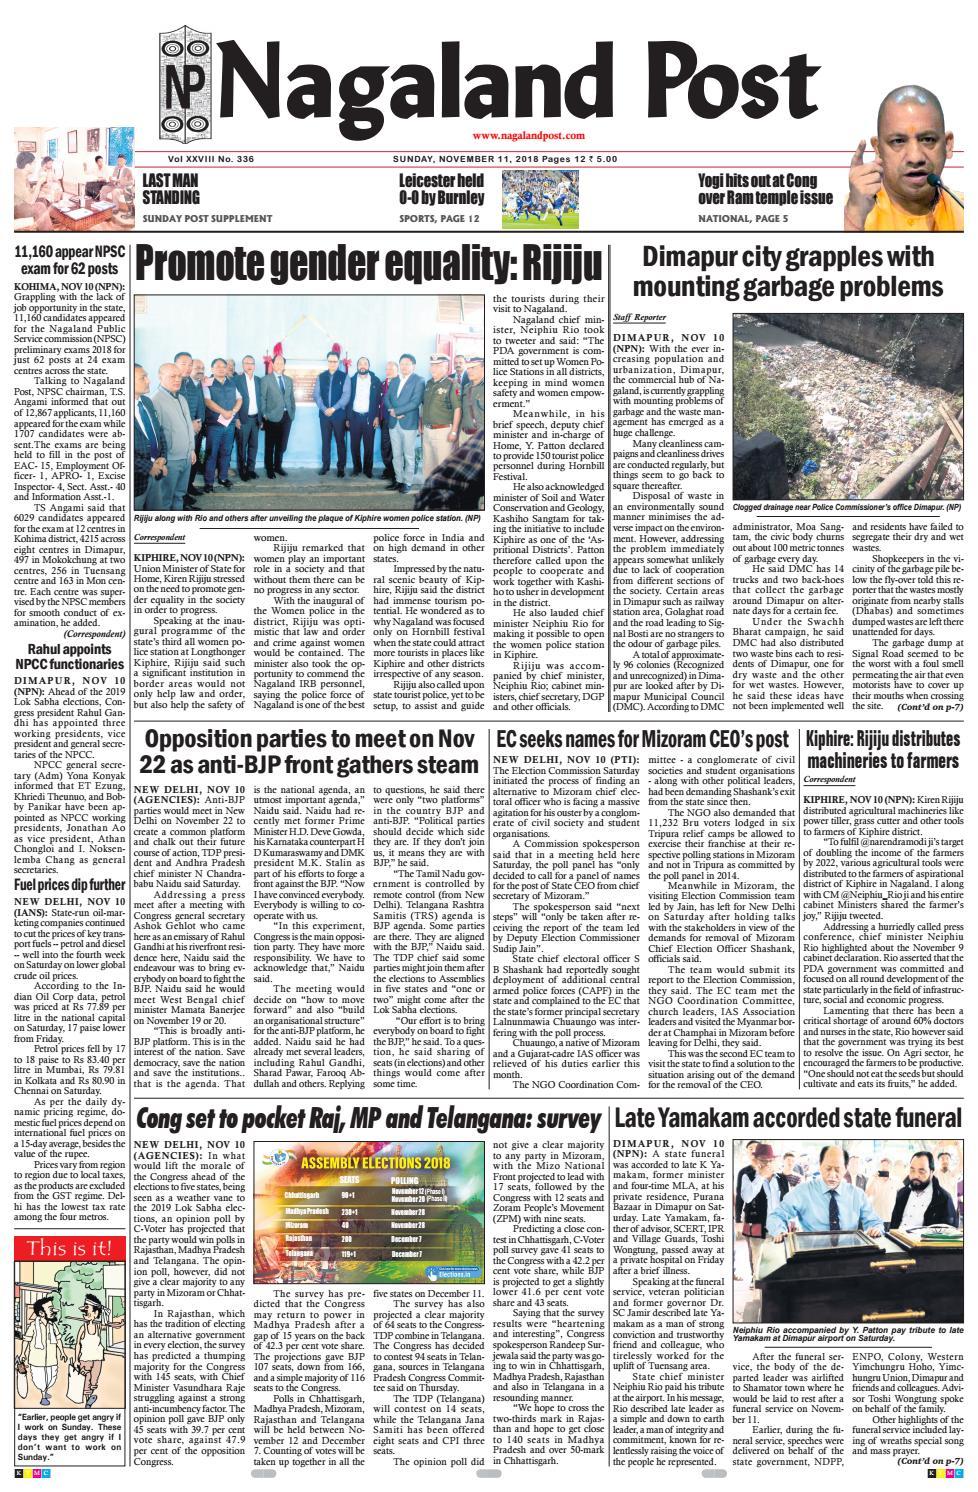 November 11, 2018 by Nagaland Post - issuu